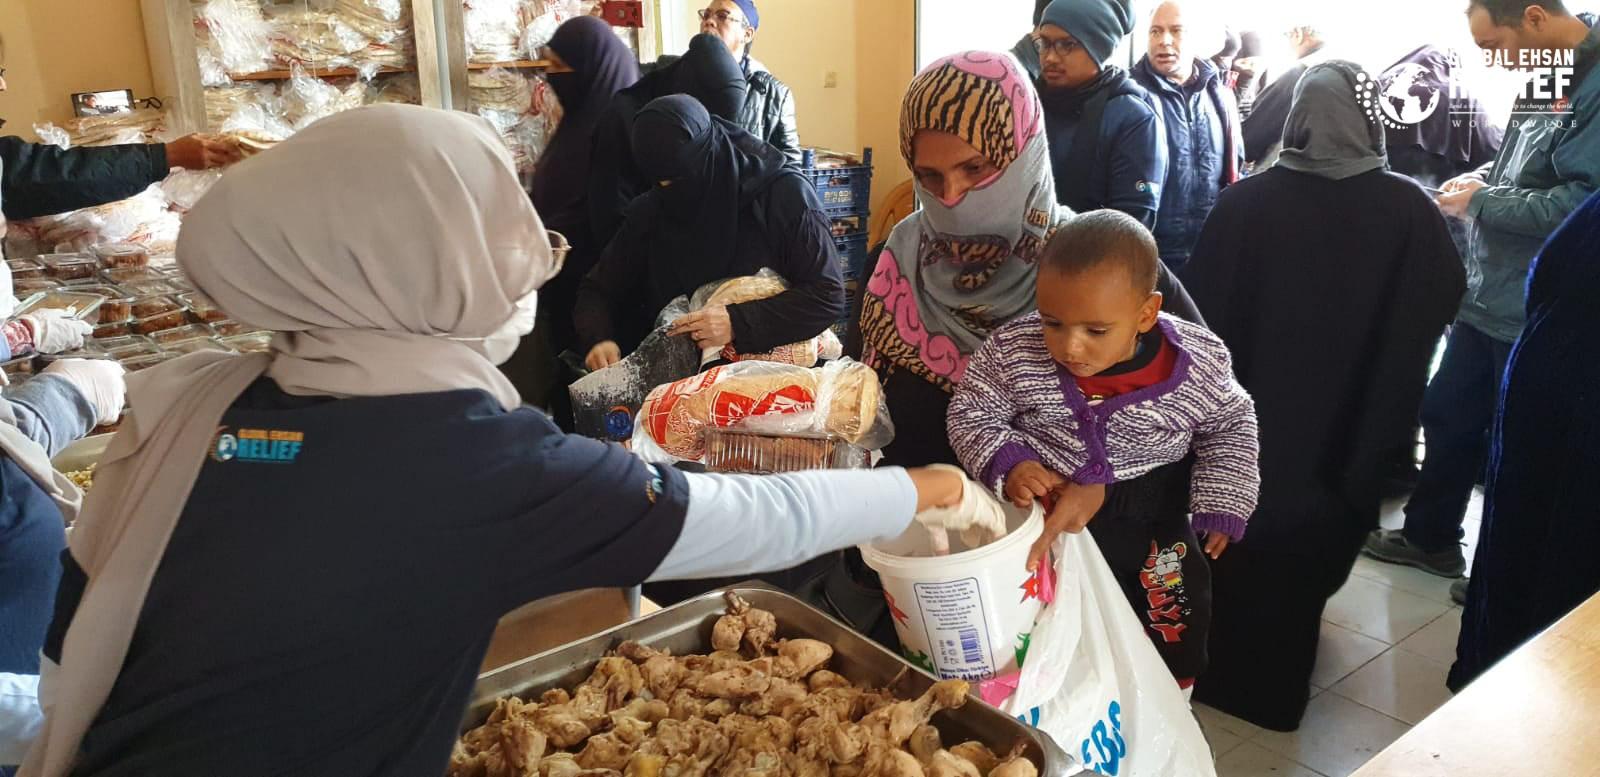 Meal Distribution at Sanliurfa, Turkey